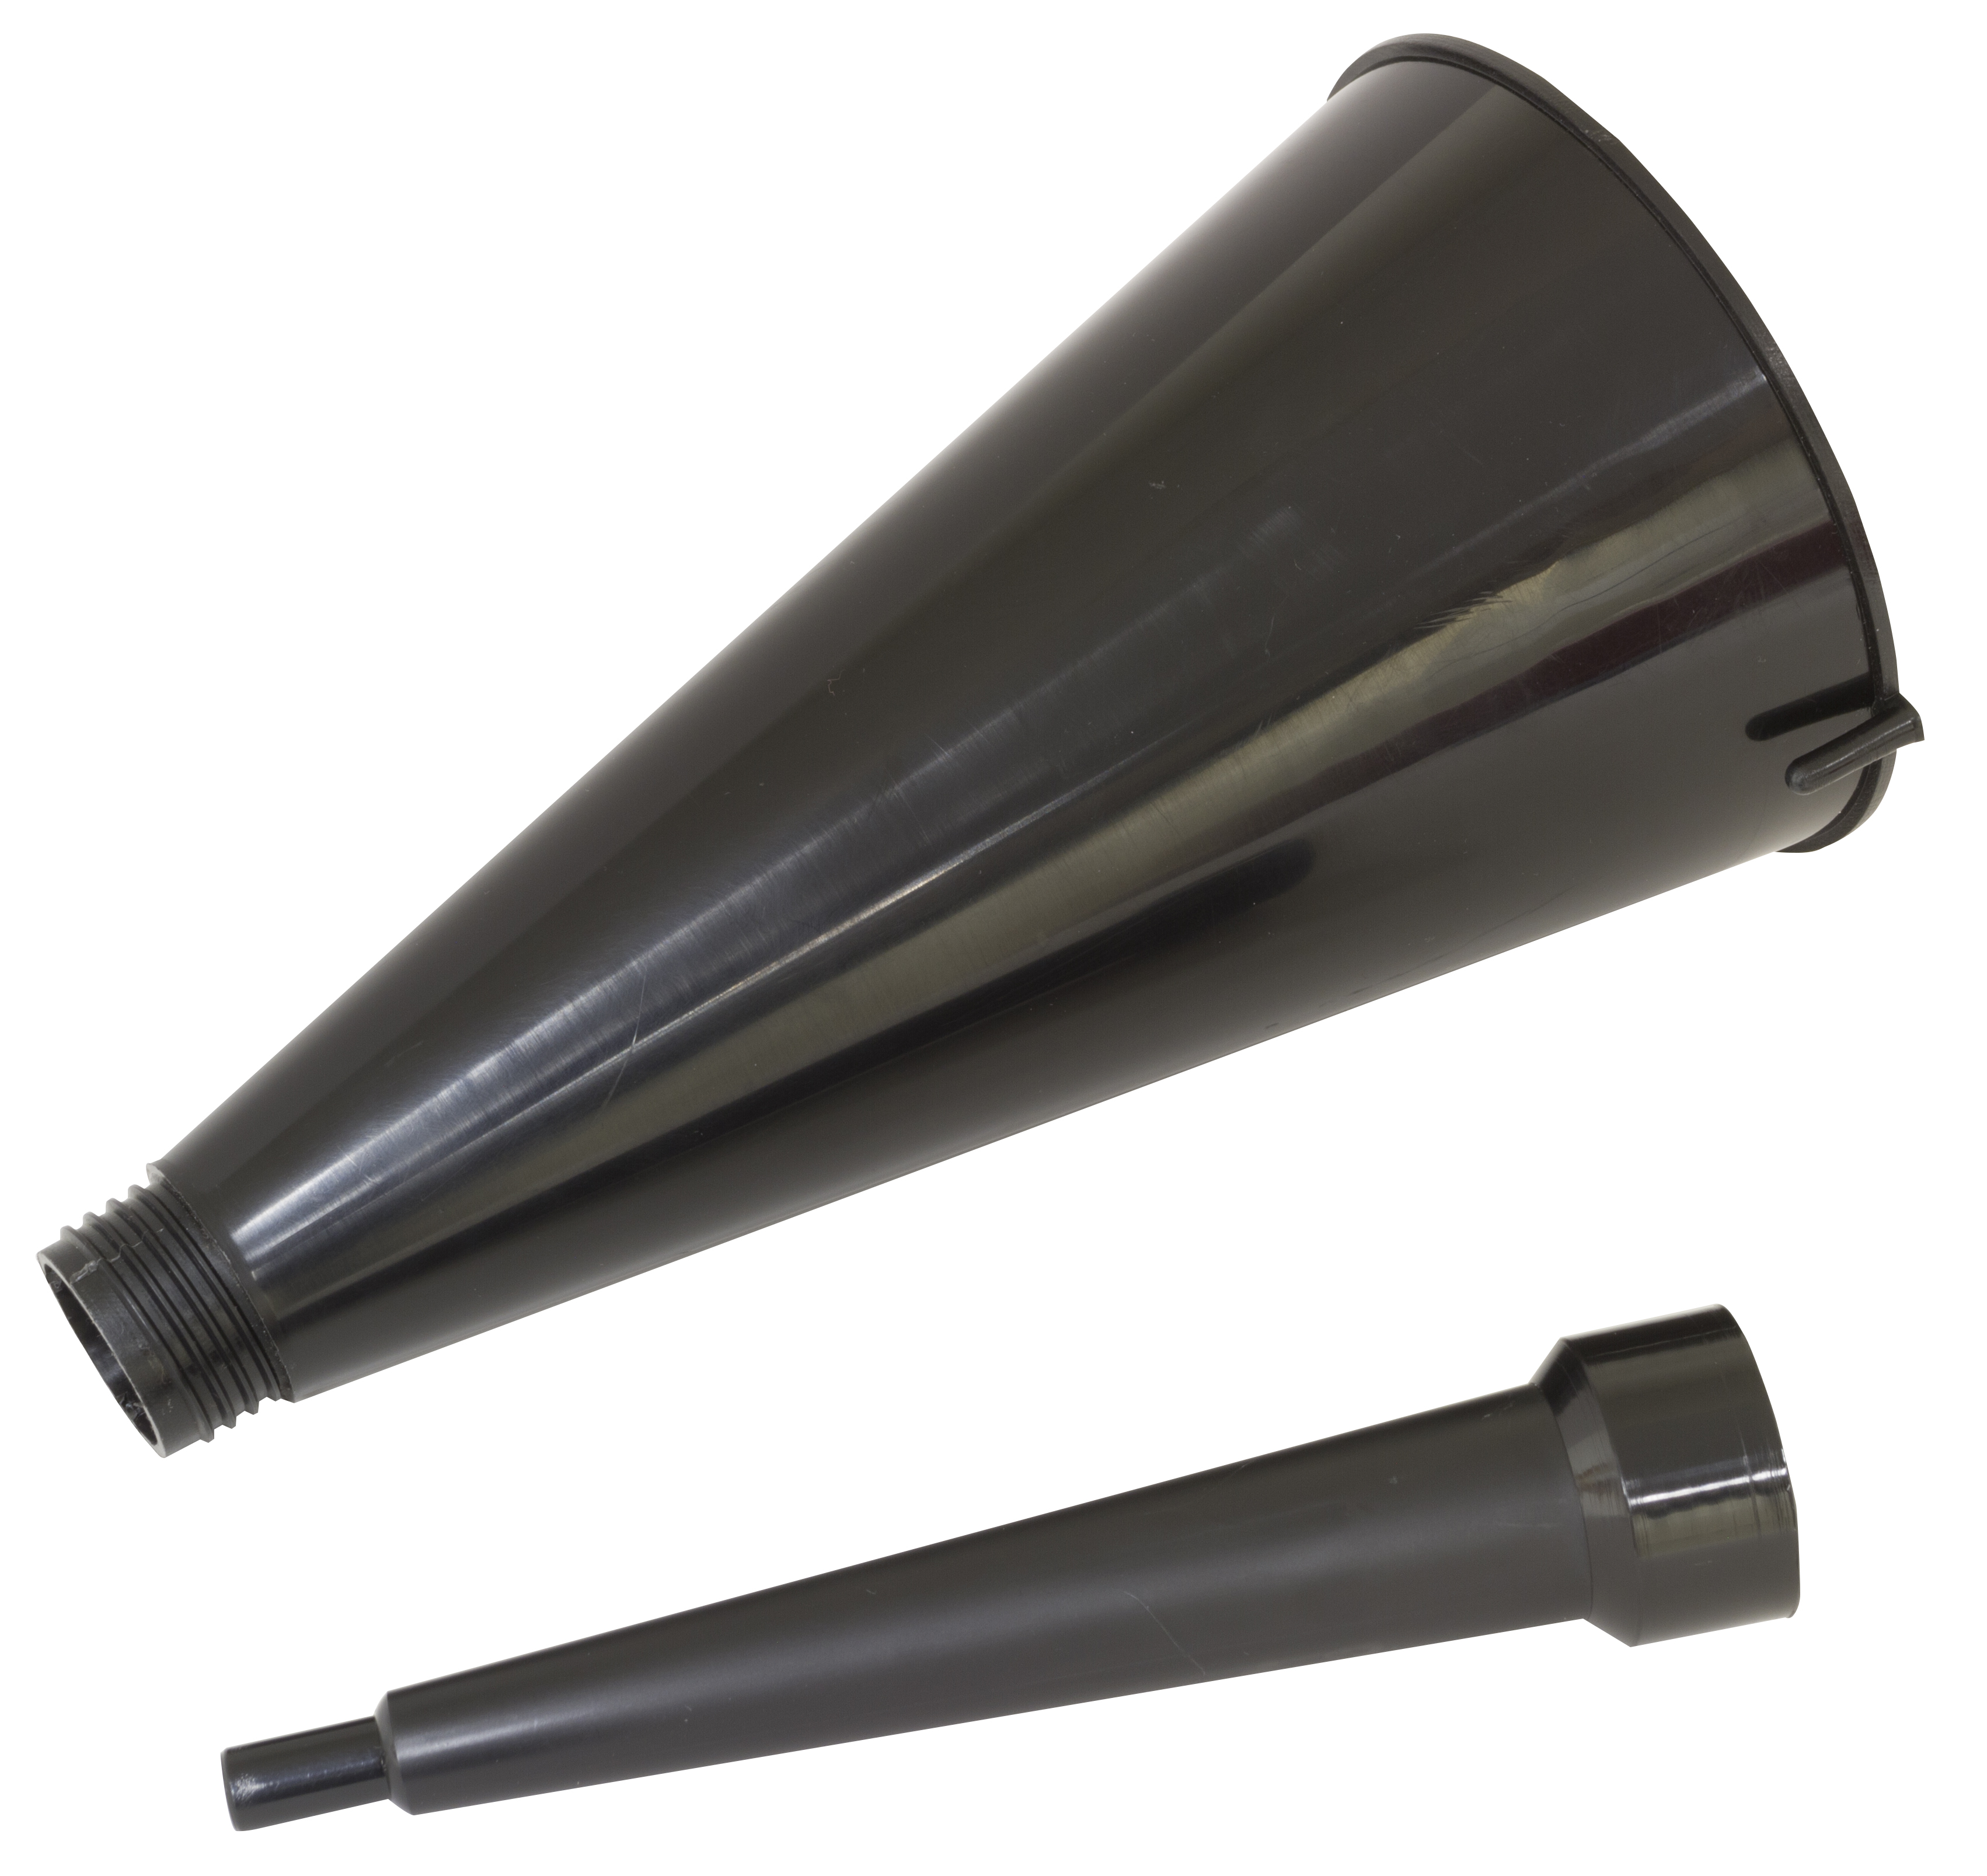 American Shifter 42644 Orange Metal Flake Shift Knob with 16mm x 1.5 Insert Orange Drip